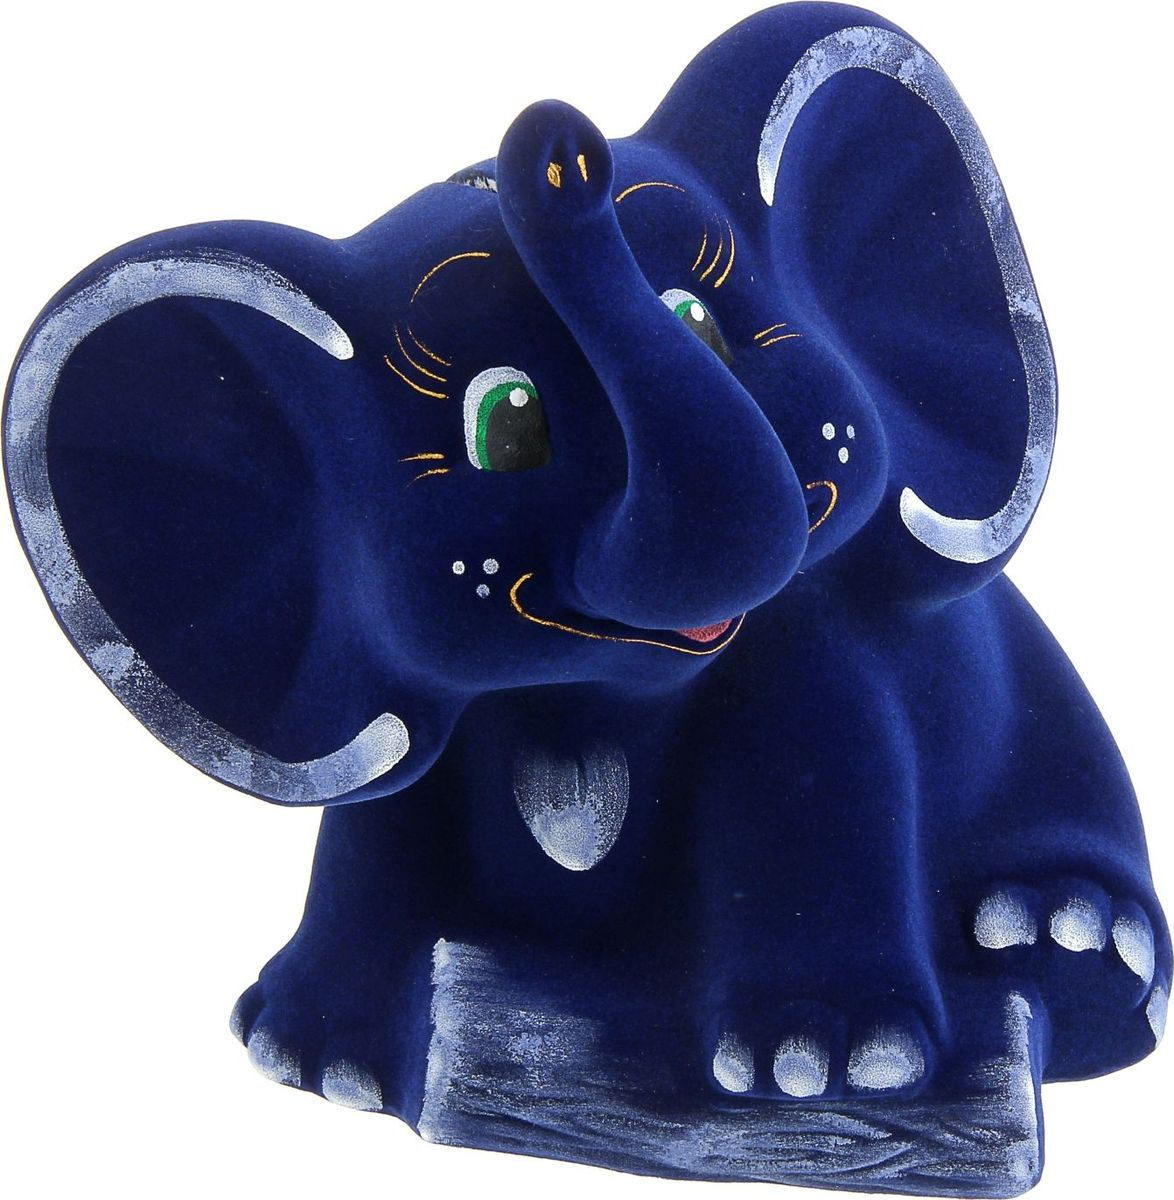 Копилка Керамика ручной работы Слон, 20 х 20 х 23 см копилка слон о бали